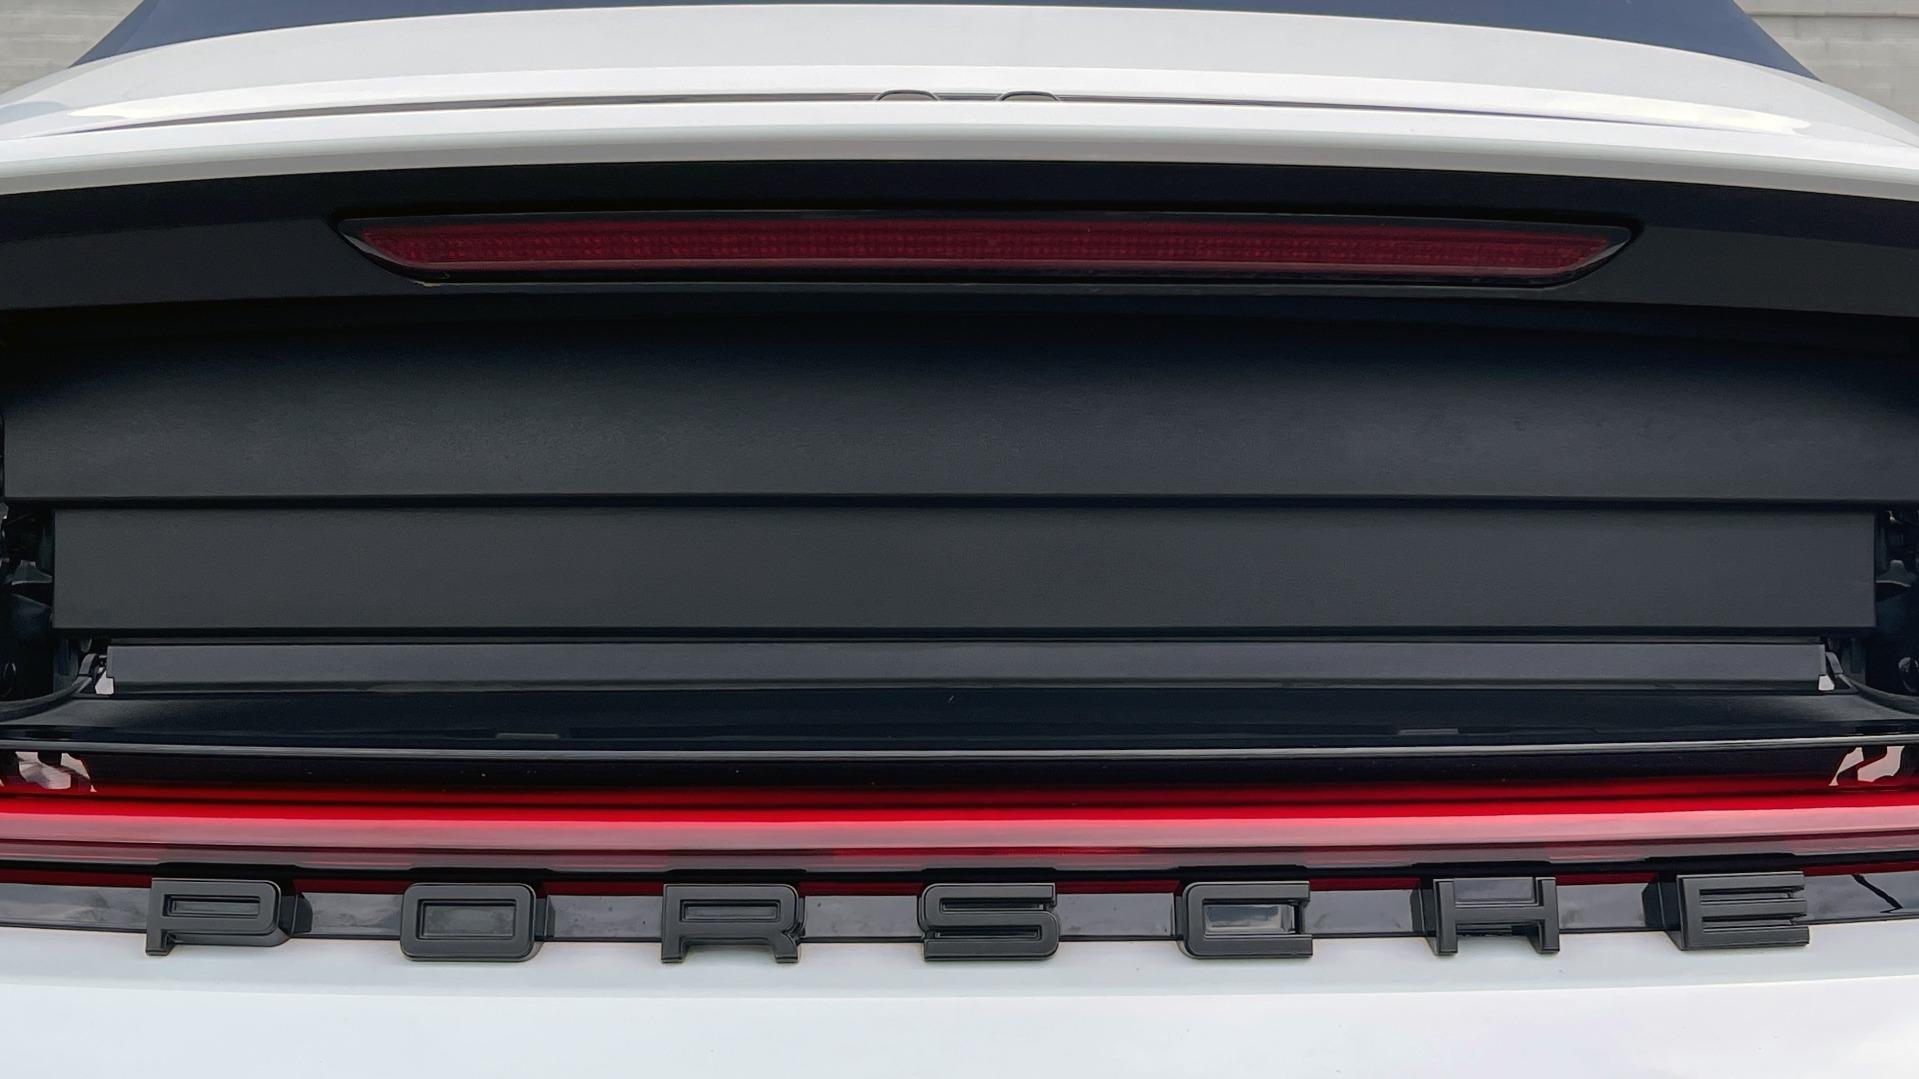 Used 2020 Porsche 911 CARRERA 4S CABRIOLET PREMIUM SPORT PKG / NAV / BOSE / LIGHT DESIGN PKG for sale $167,595 at Formula Imports in Charlotte NC 28227 34